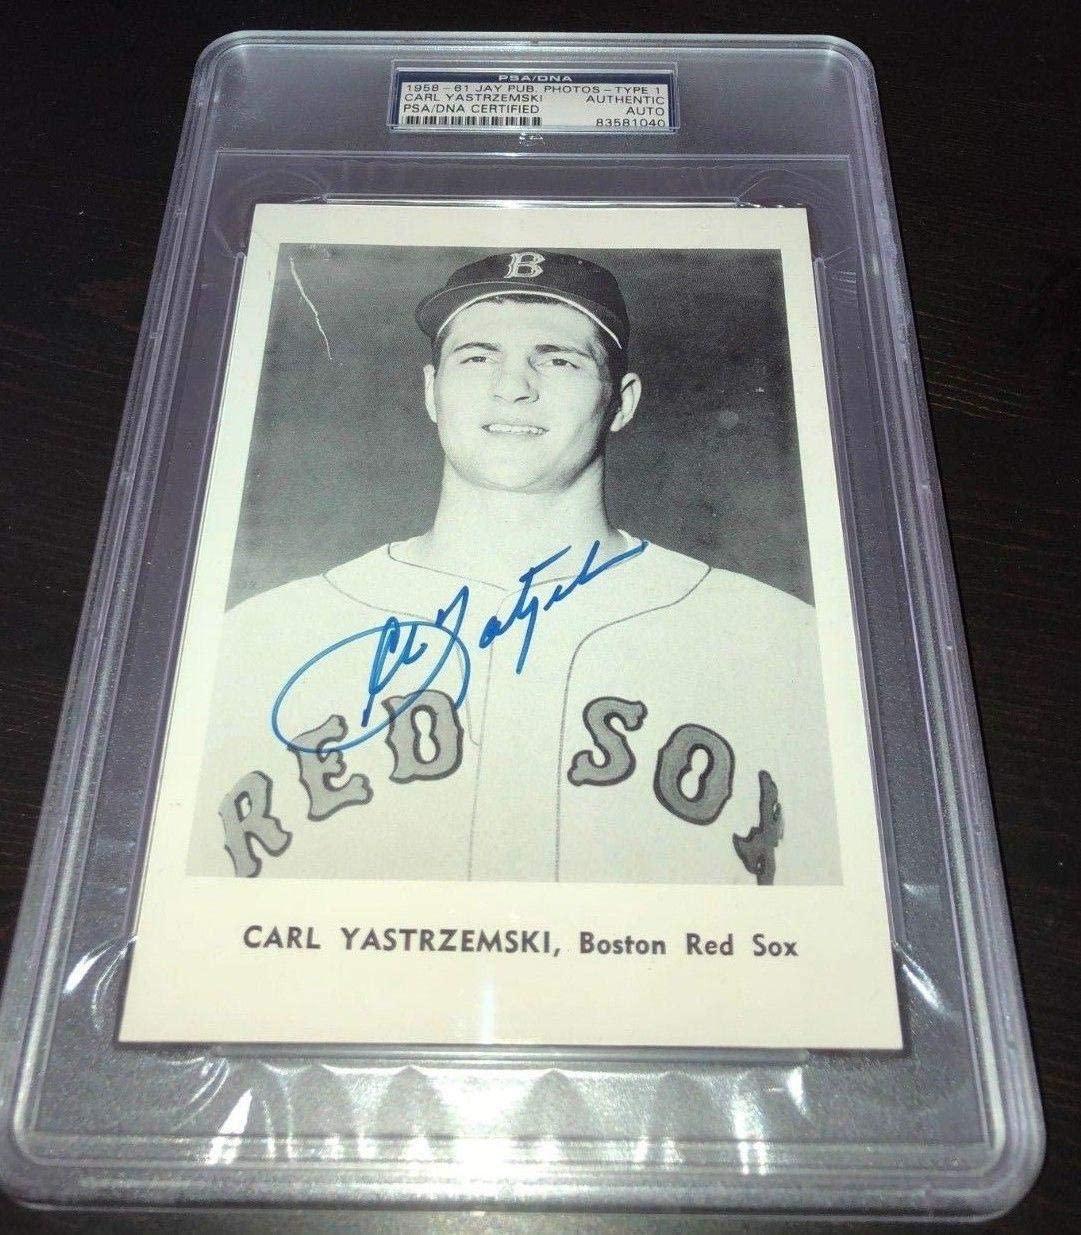 Carl Yastrzemski 1958-61 Jay Publishing signed auto PSA/DNA Type 1 Red Sox HOF - MLB Autographed Miscellaneous Items